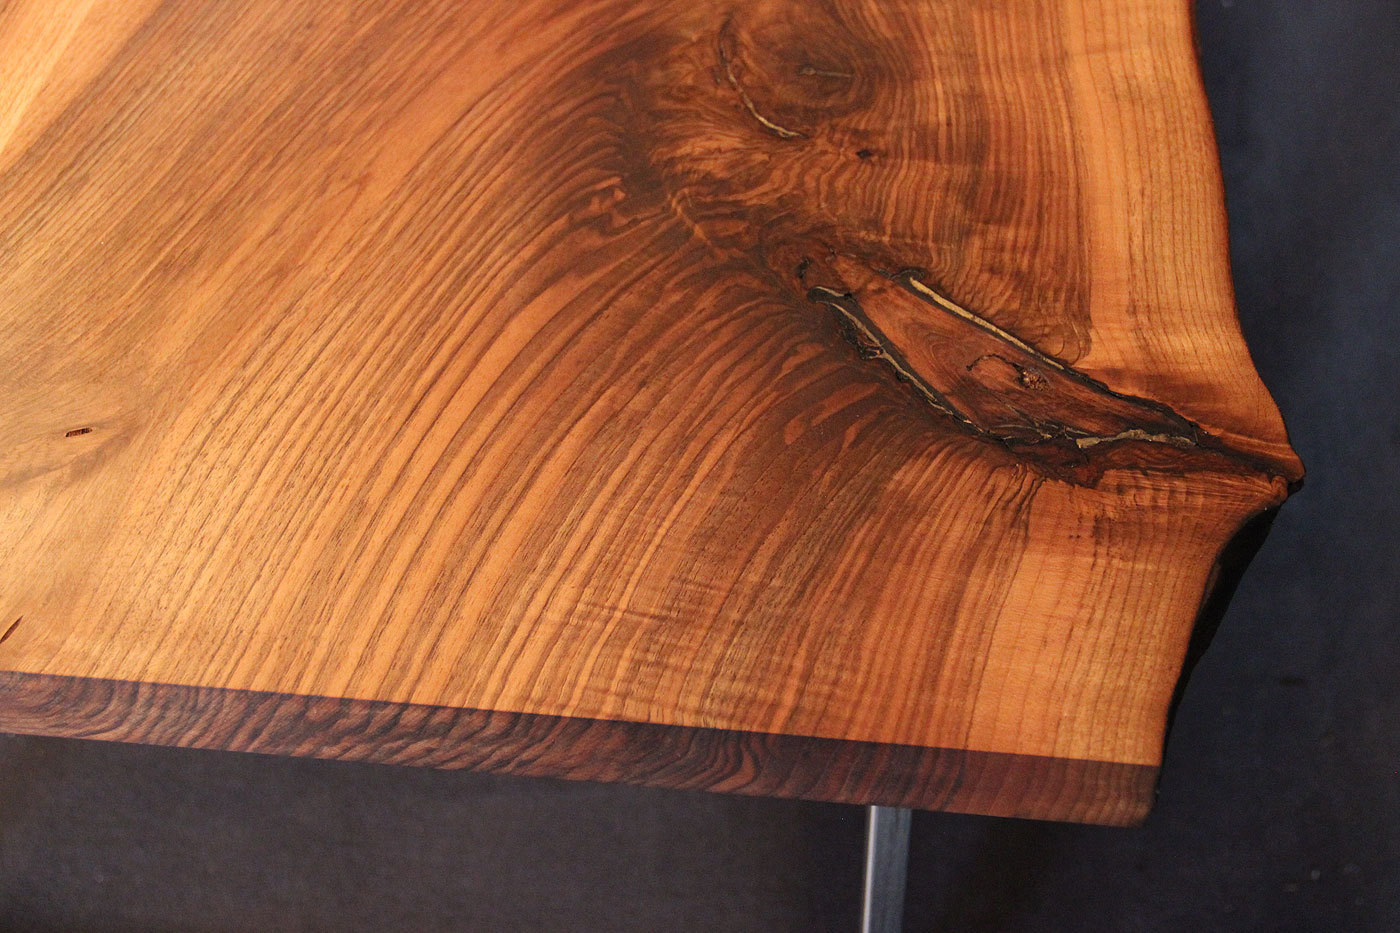 Tischplatte Massivholz Baumkante ~ Massivholz Tischplatte Nußbaum kaukasisch, gedämpft, Rustikal mit